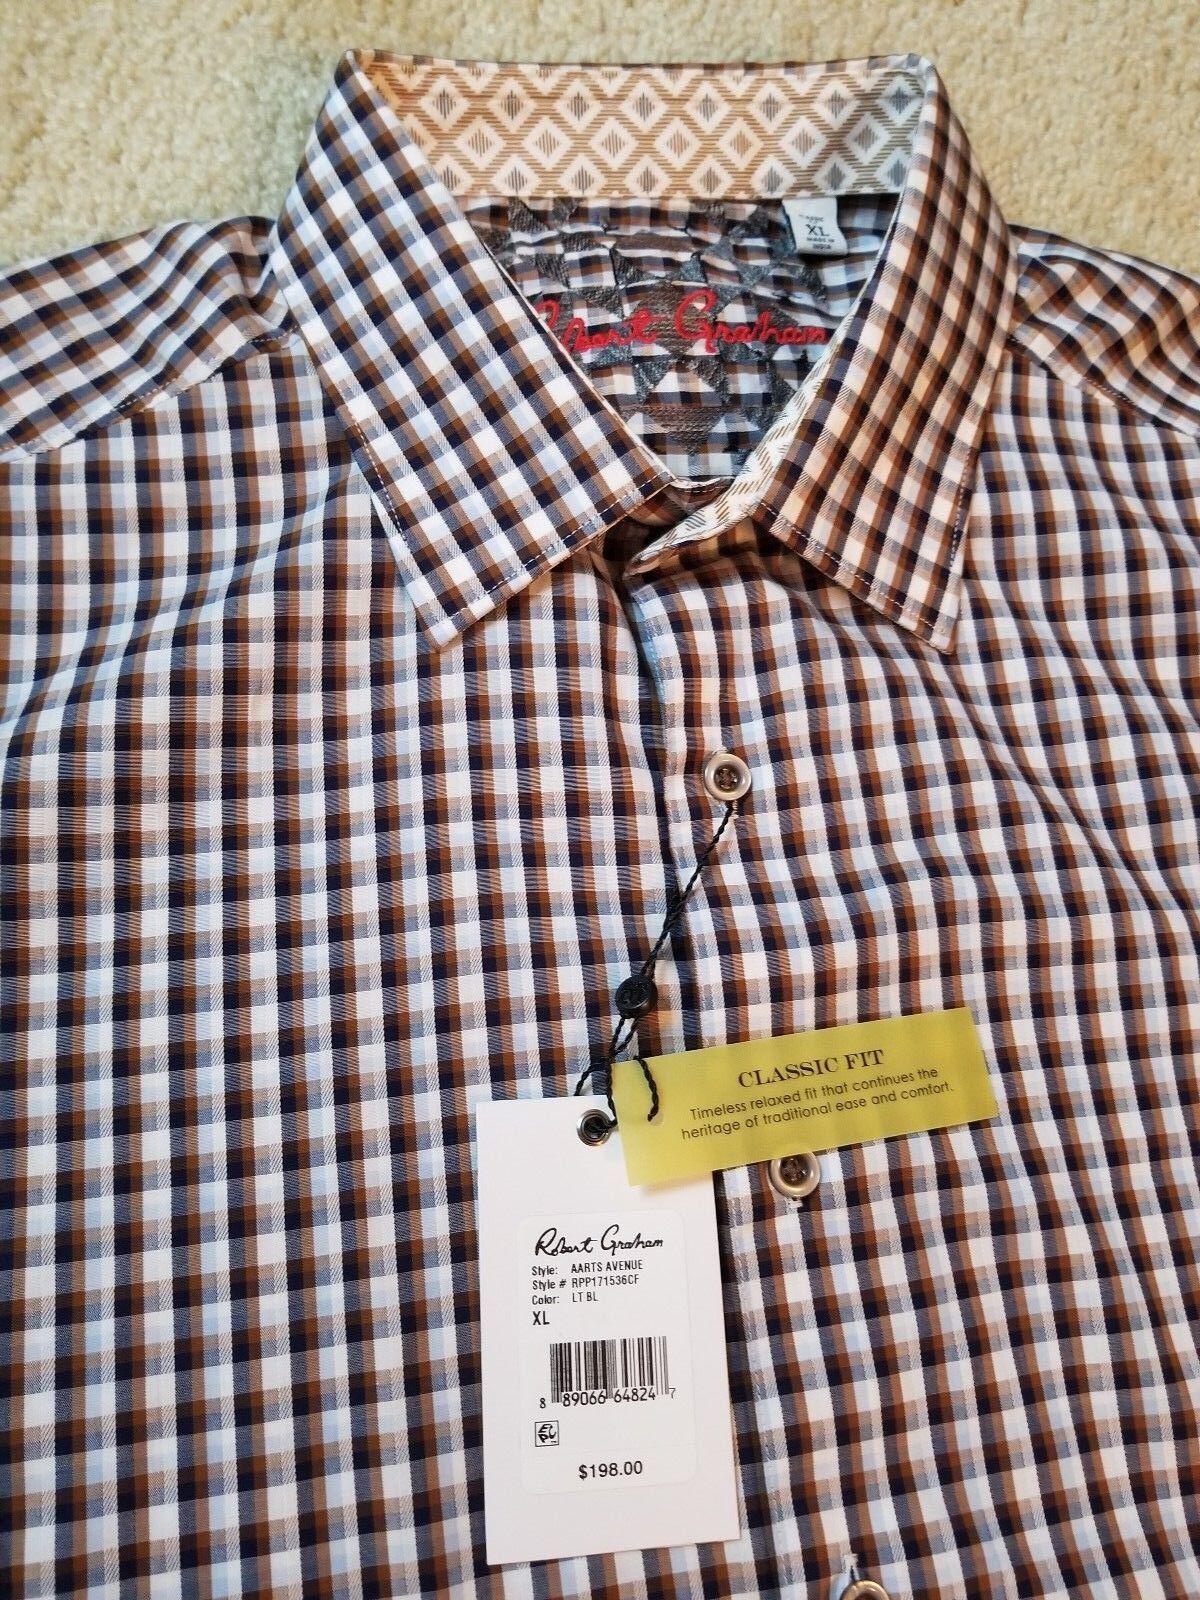 NWT herren ROBERT GRAHAM AARTS AVENUE DRESS hemd Größe XL NEW MSRP  198